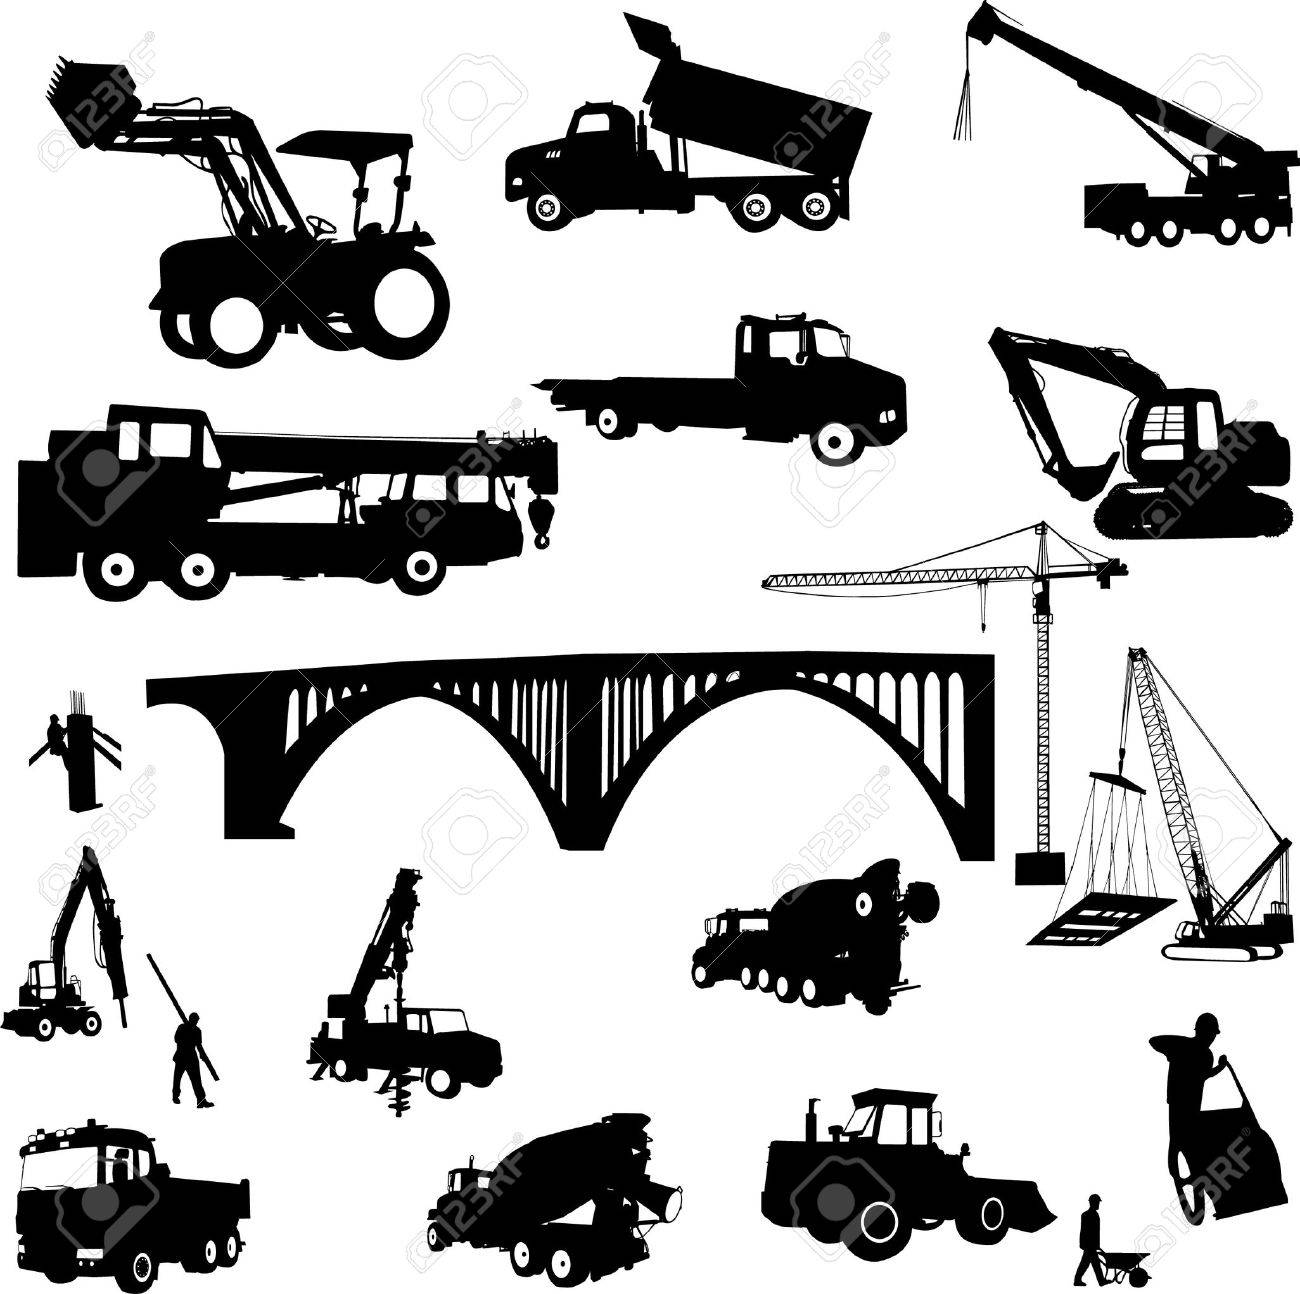 construction objects vector (crane - worker - building - skimmer) Stock Vector - 5791883